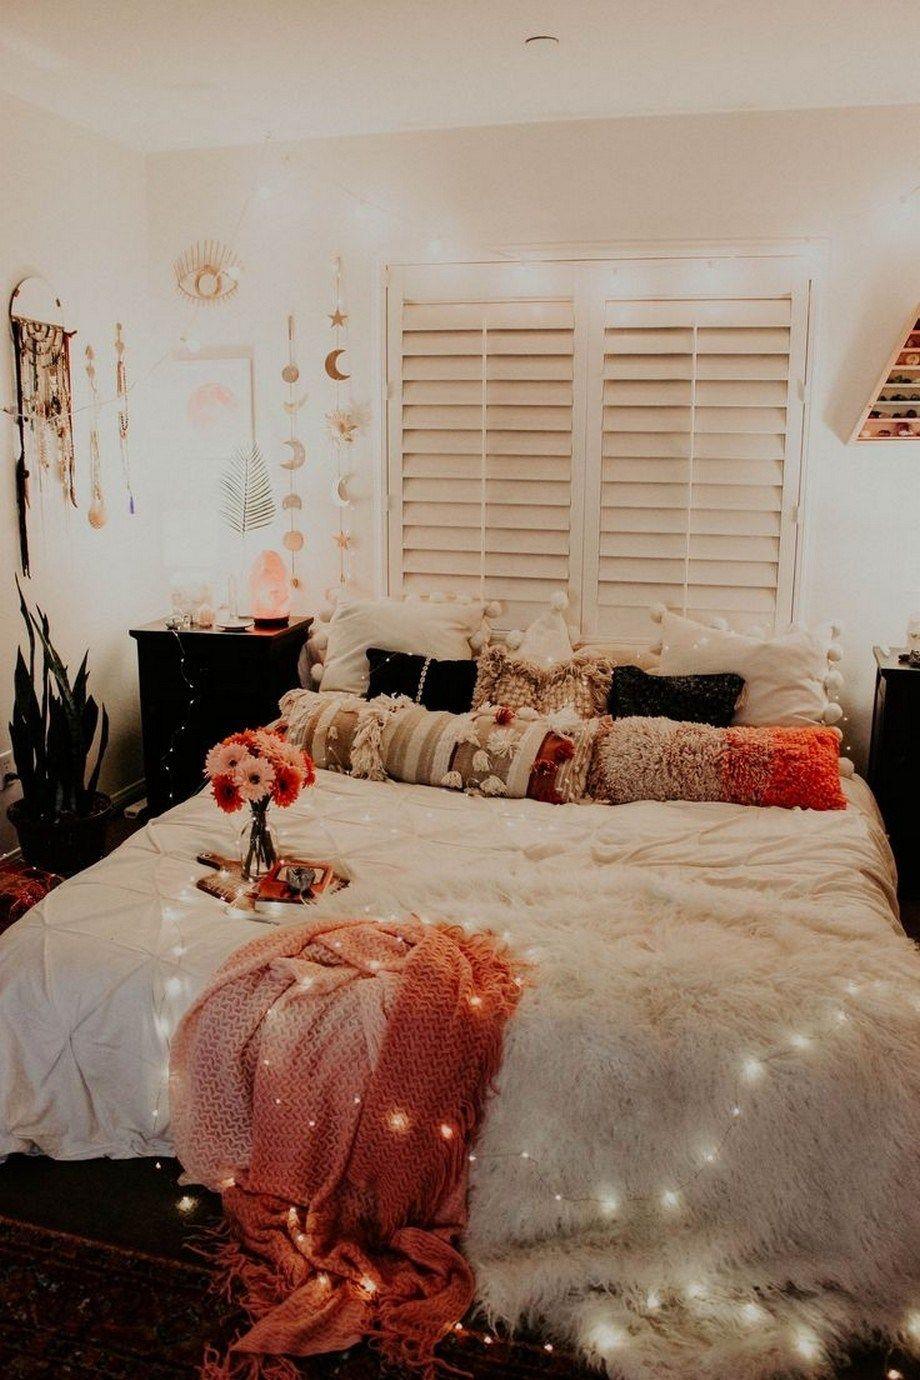 35 Stylish Dorm Room Ideas Decor Essentials 18 Avec Images